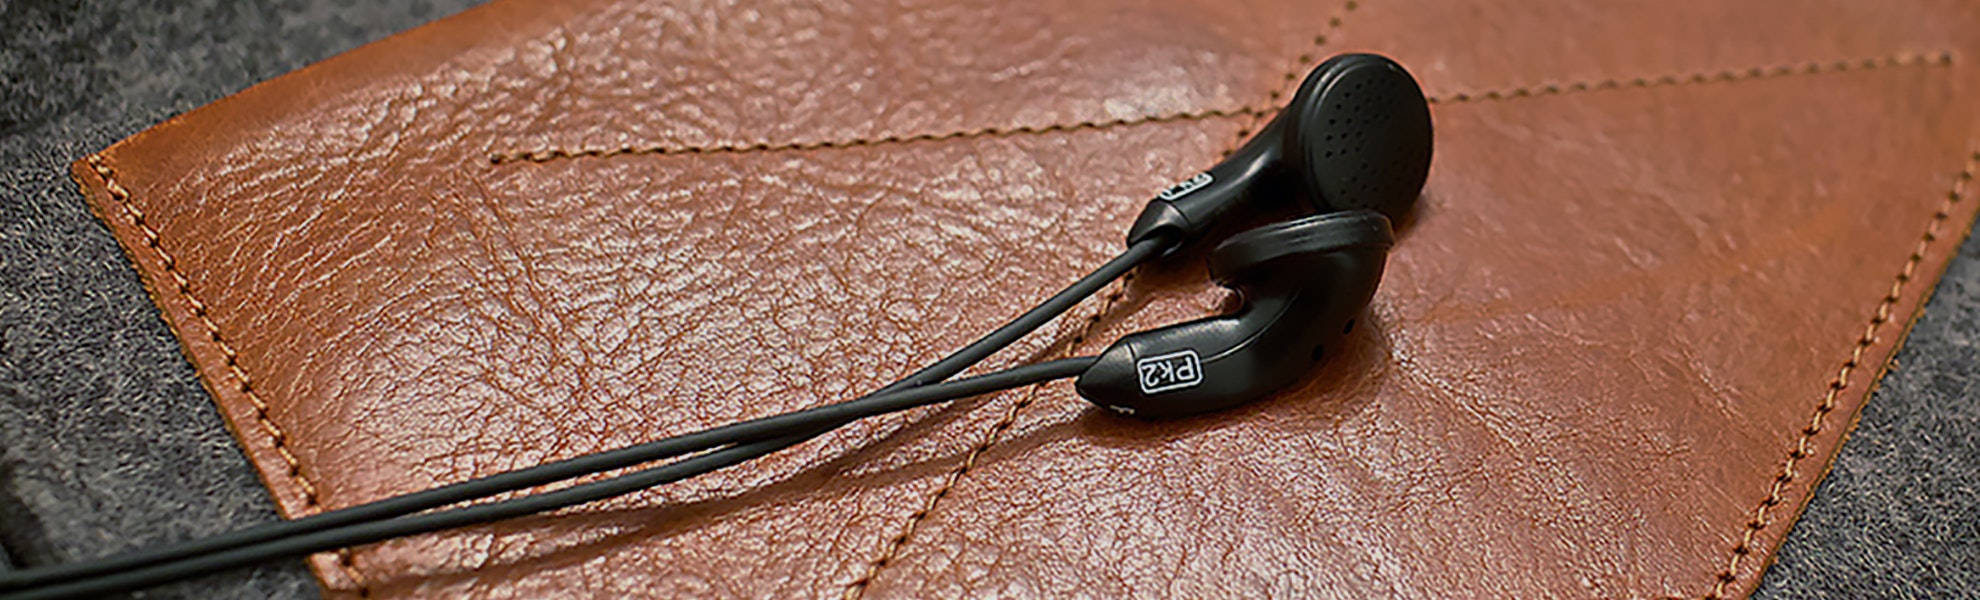 Yuin PK2 Earbuds